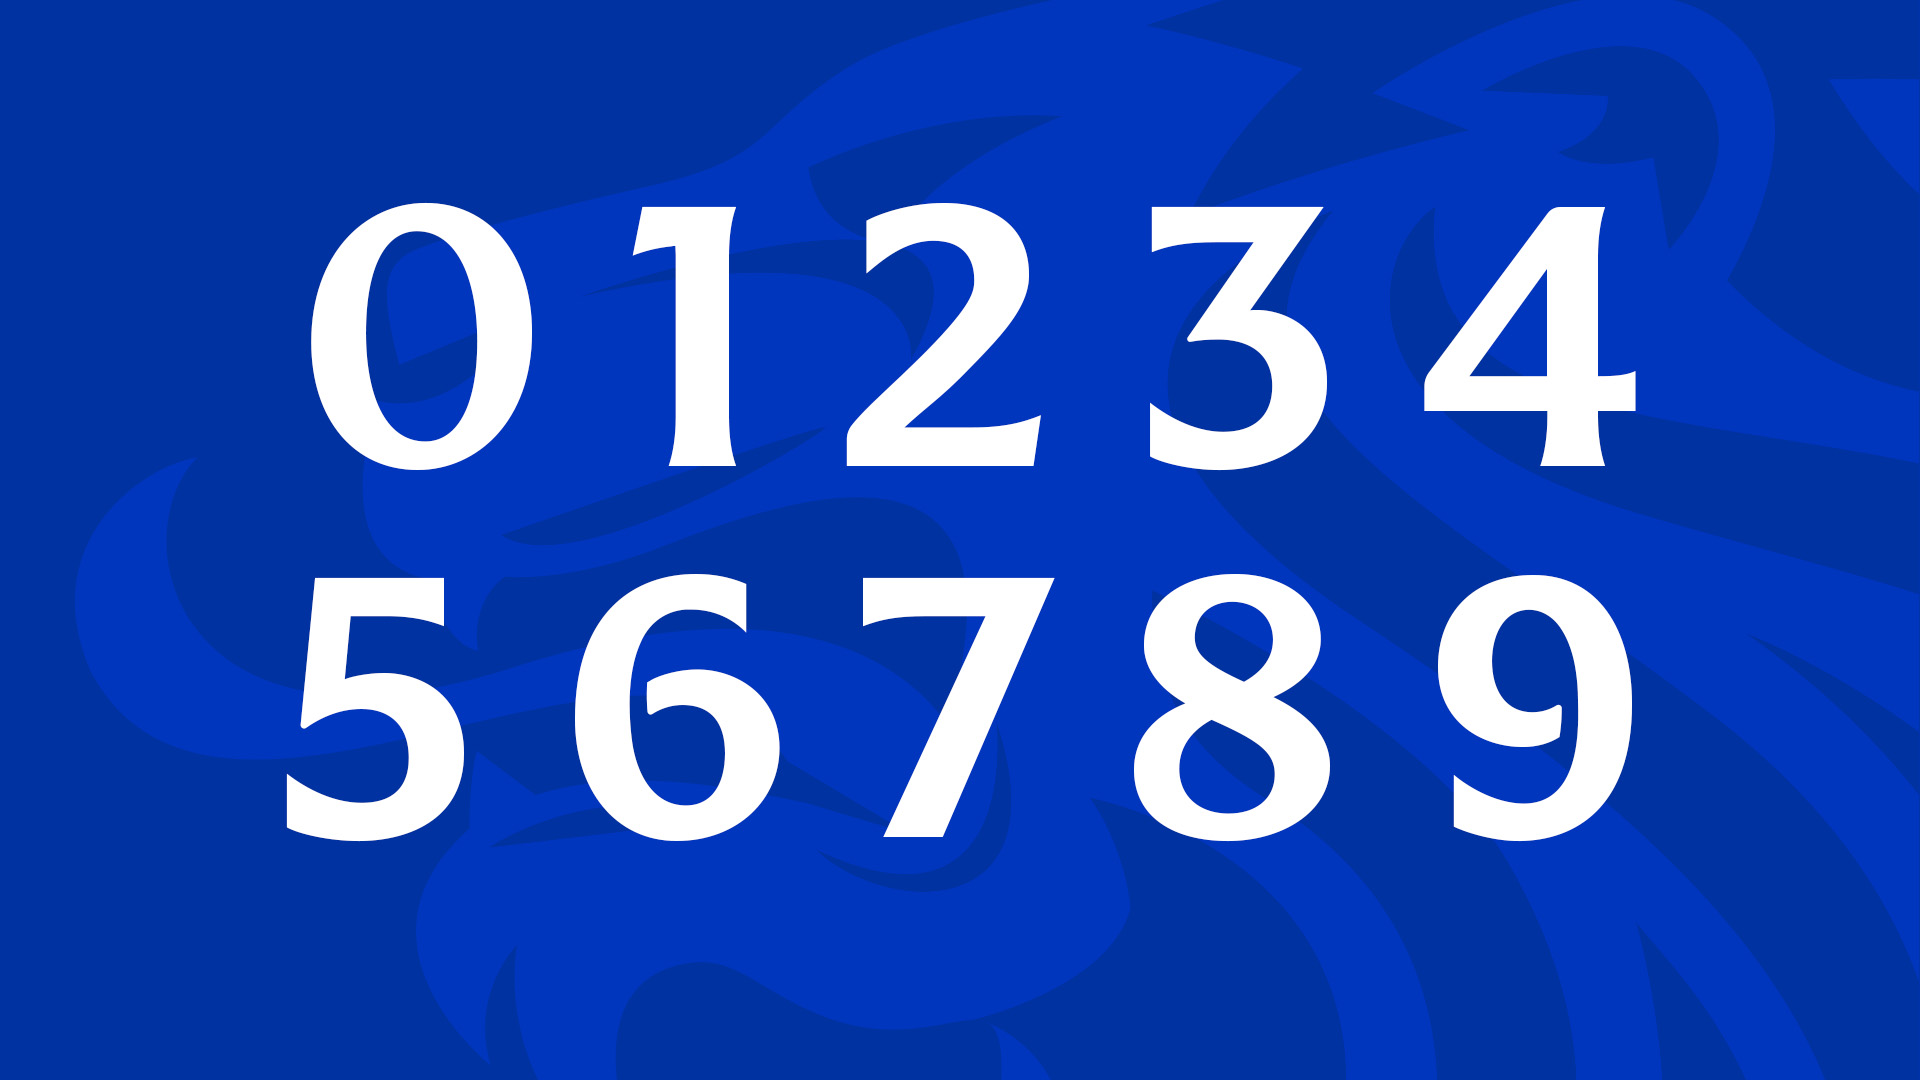 Rangers FC numerals